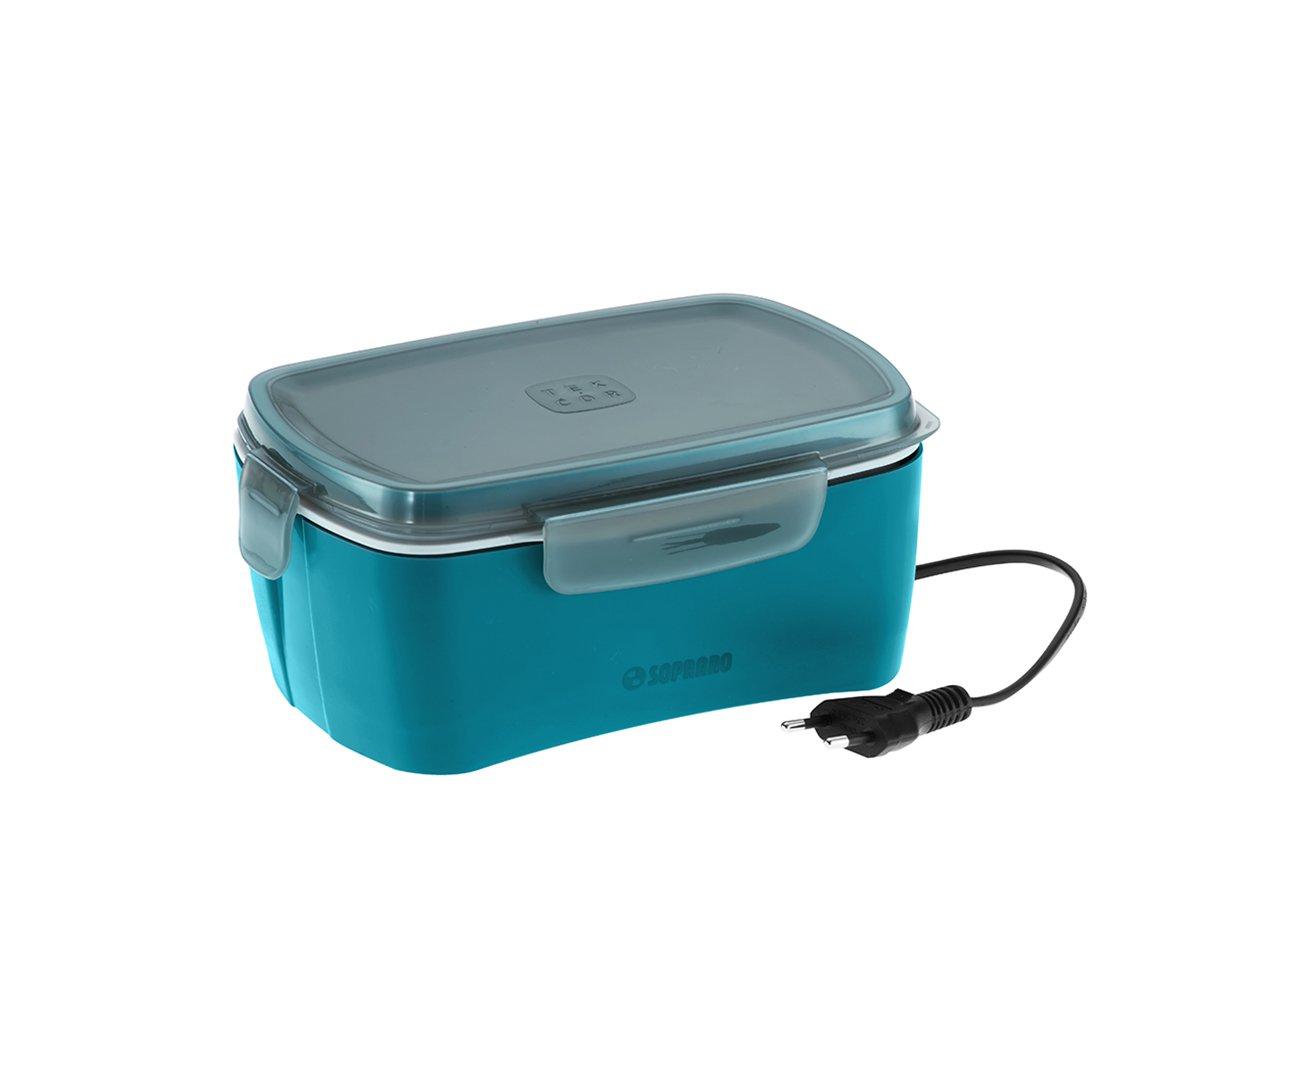 Marmita Eletrica Tekcor 1,2l Bi-volt Azul - Soprano